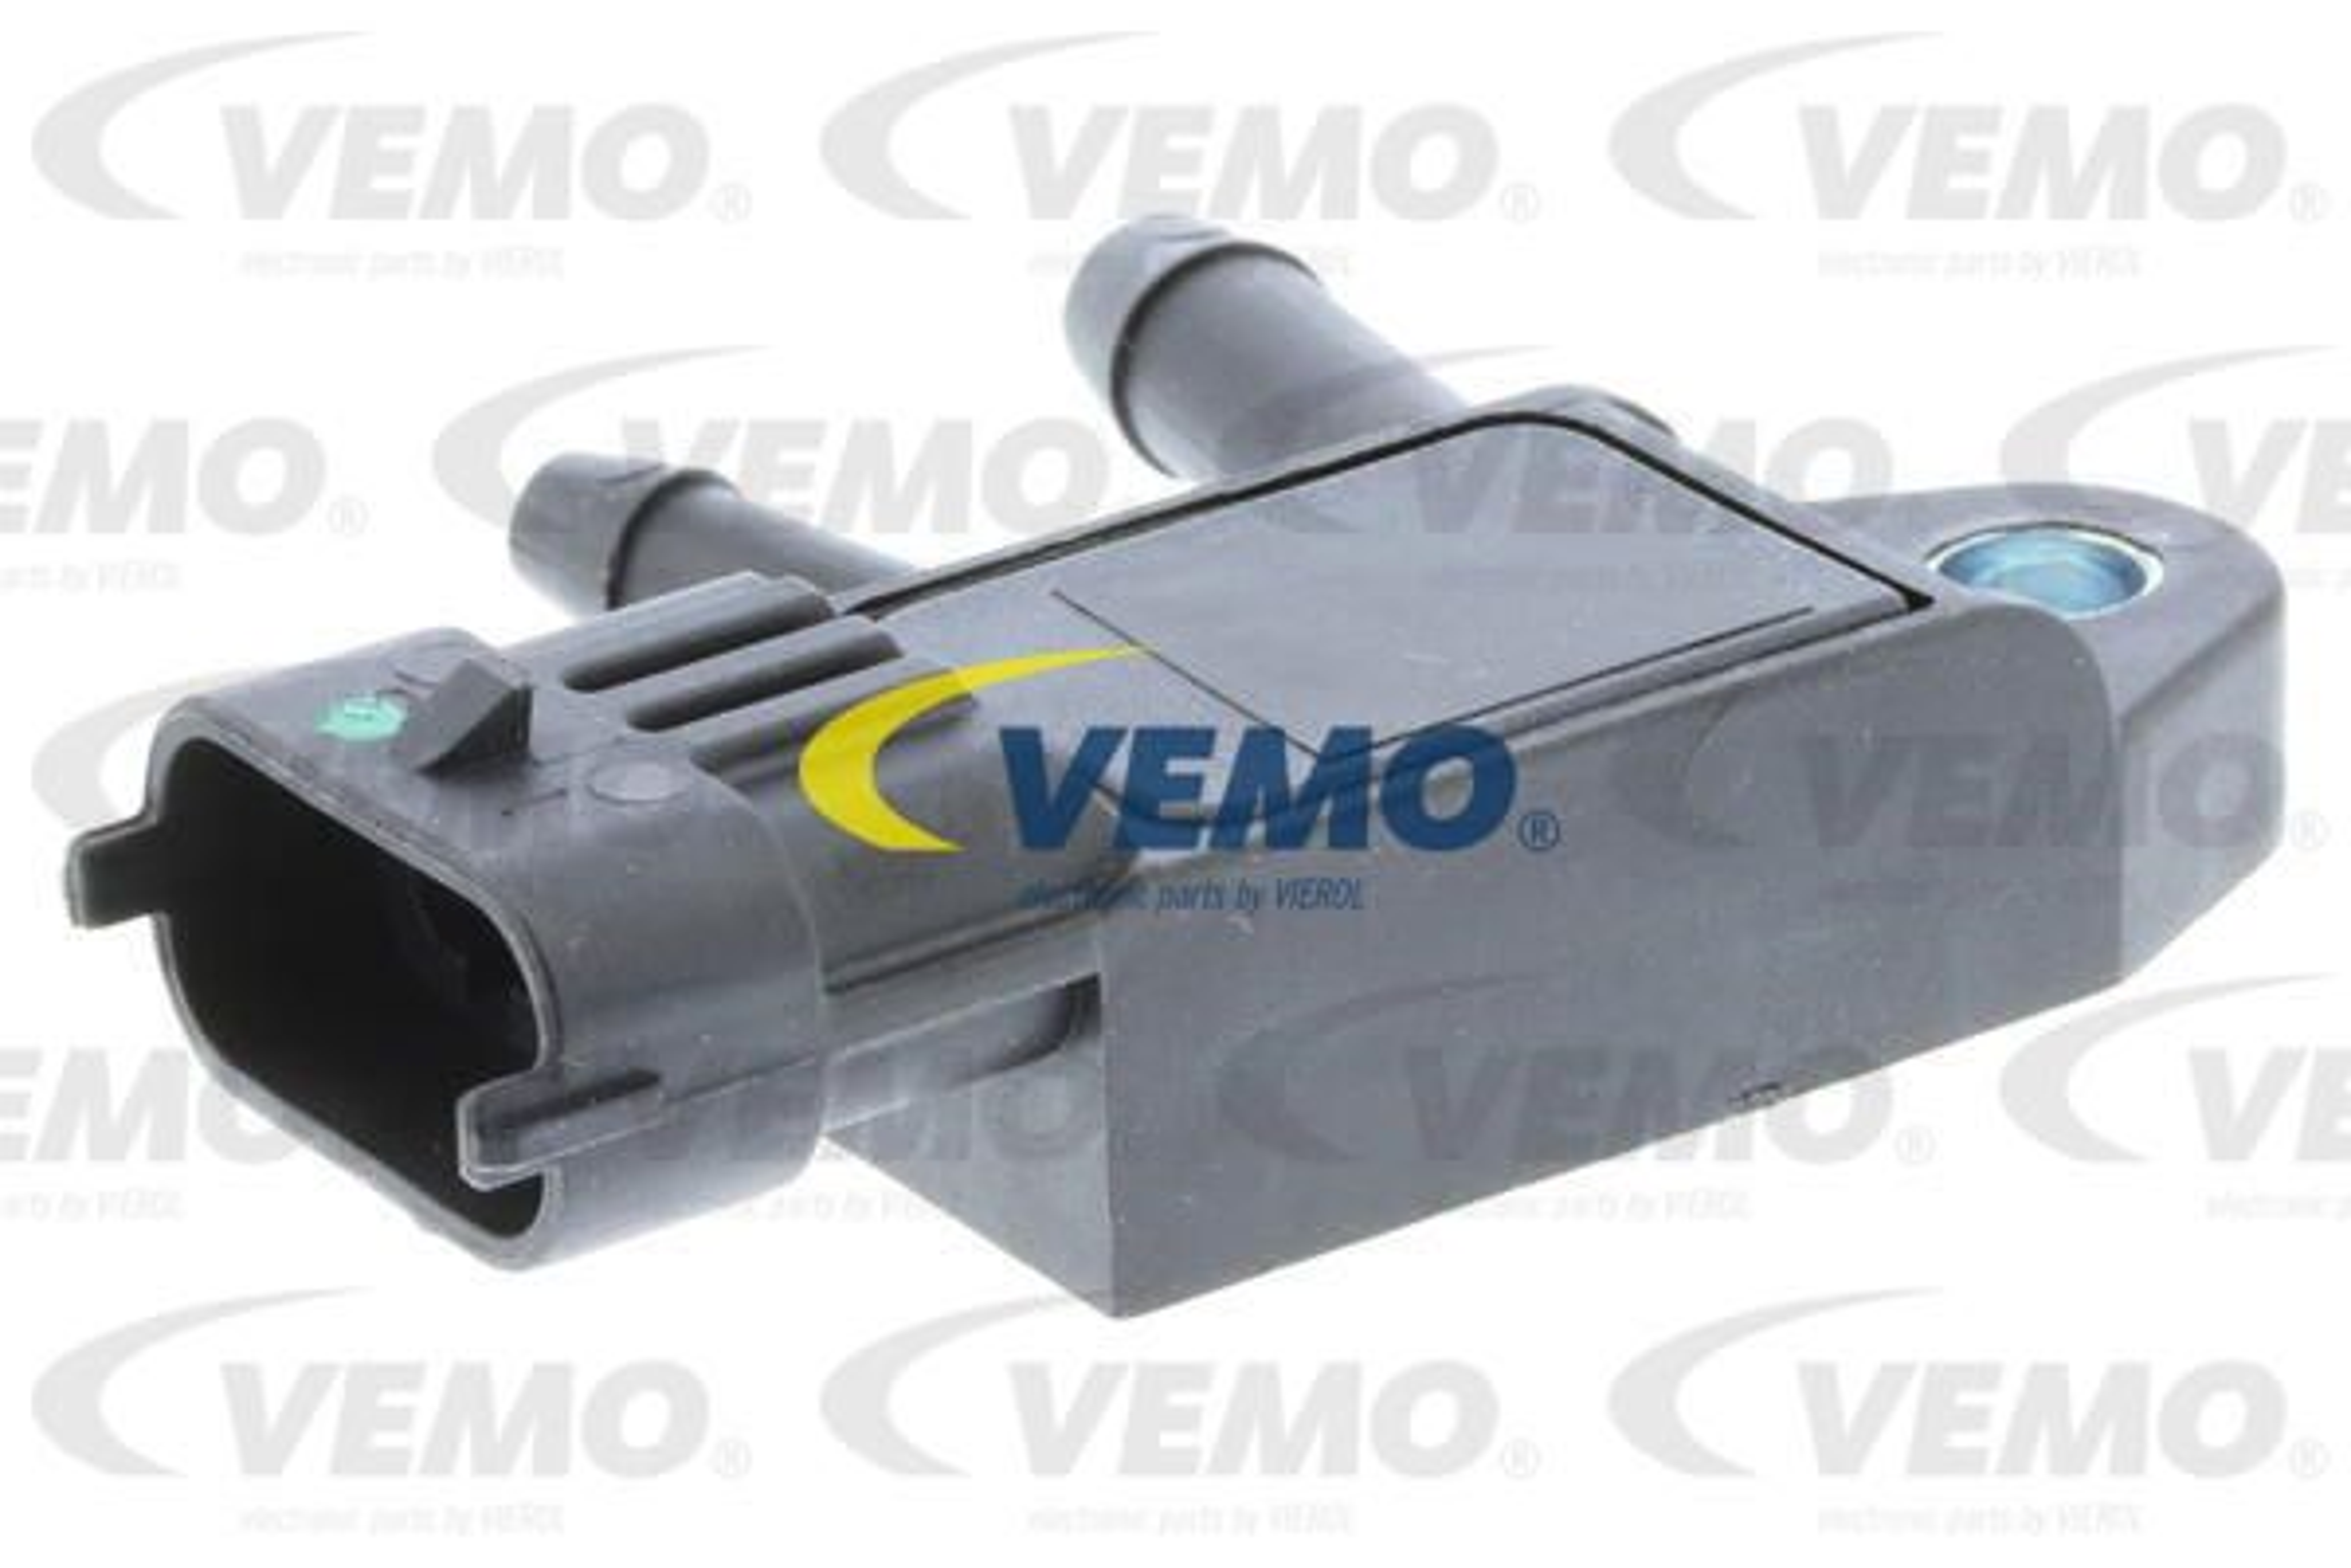 VEMO: Original Differenzdrucksensor V38-72-0126 (Pol-Anzahl: 3-polig)